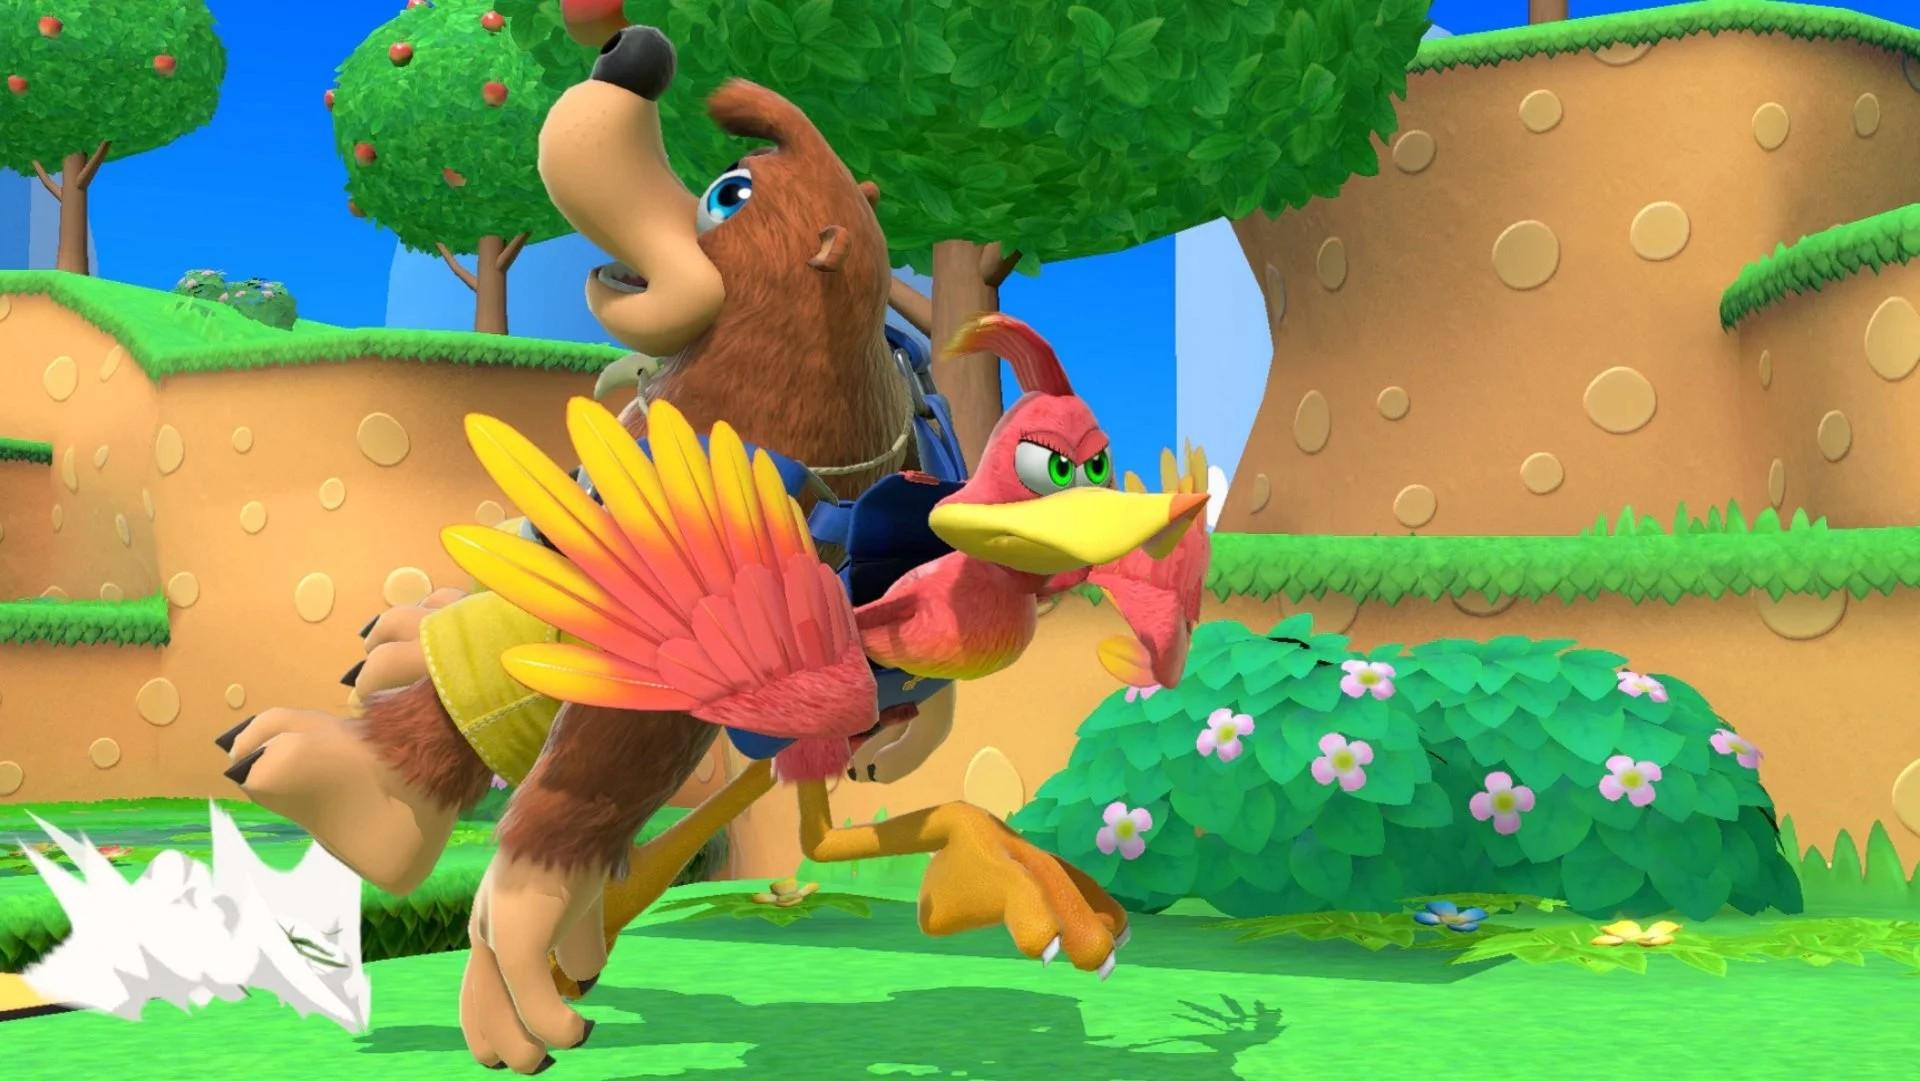 Yooka-Laylee studio shuts down rumors that they're making a Banjo-Kazooie game for Microsoft screenshot